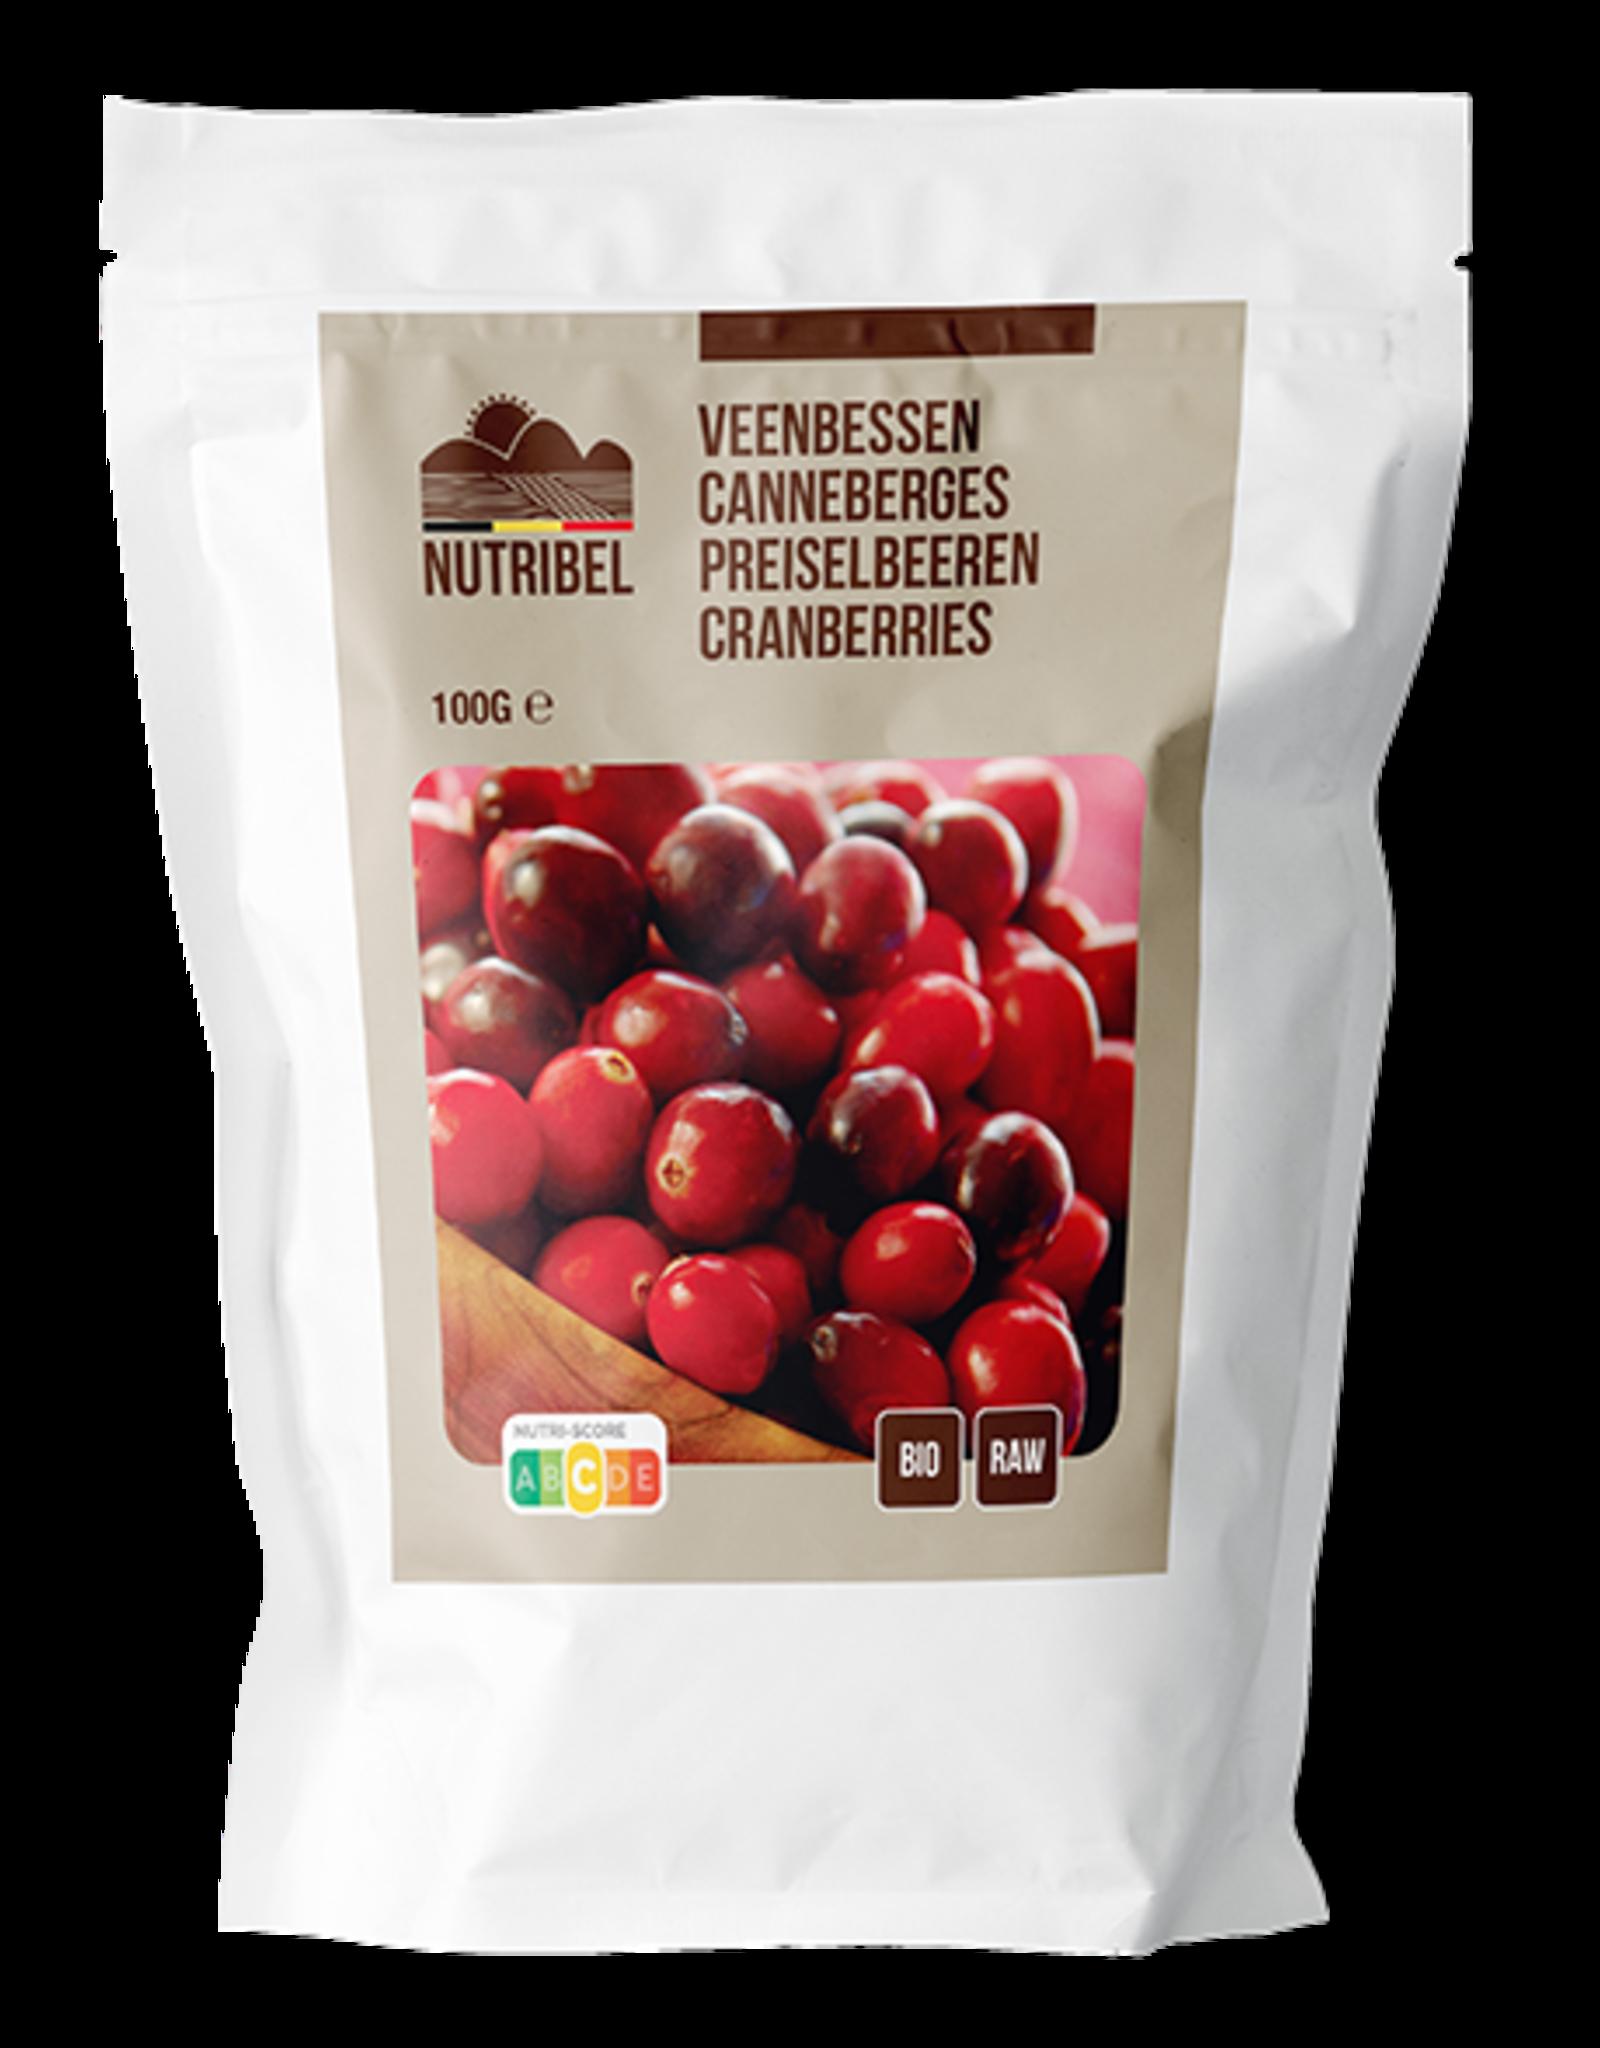 Nutribel Canneberges bio & raw 100g